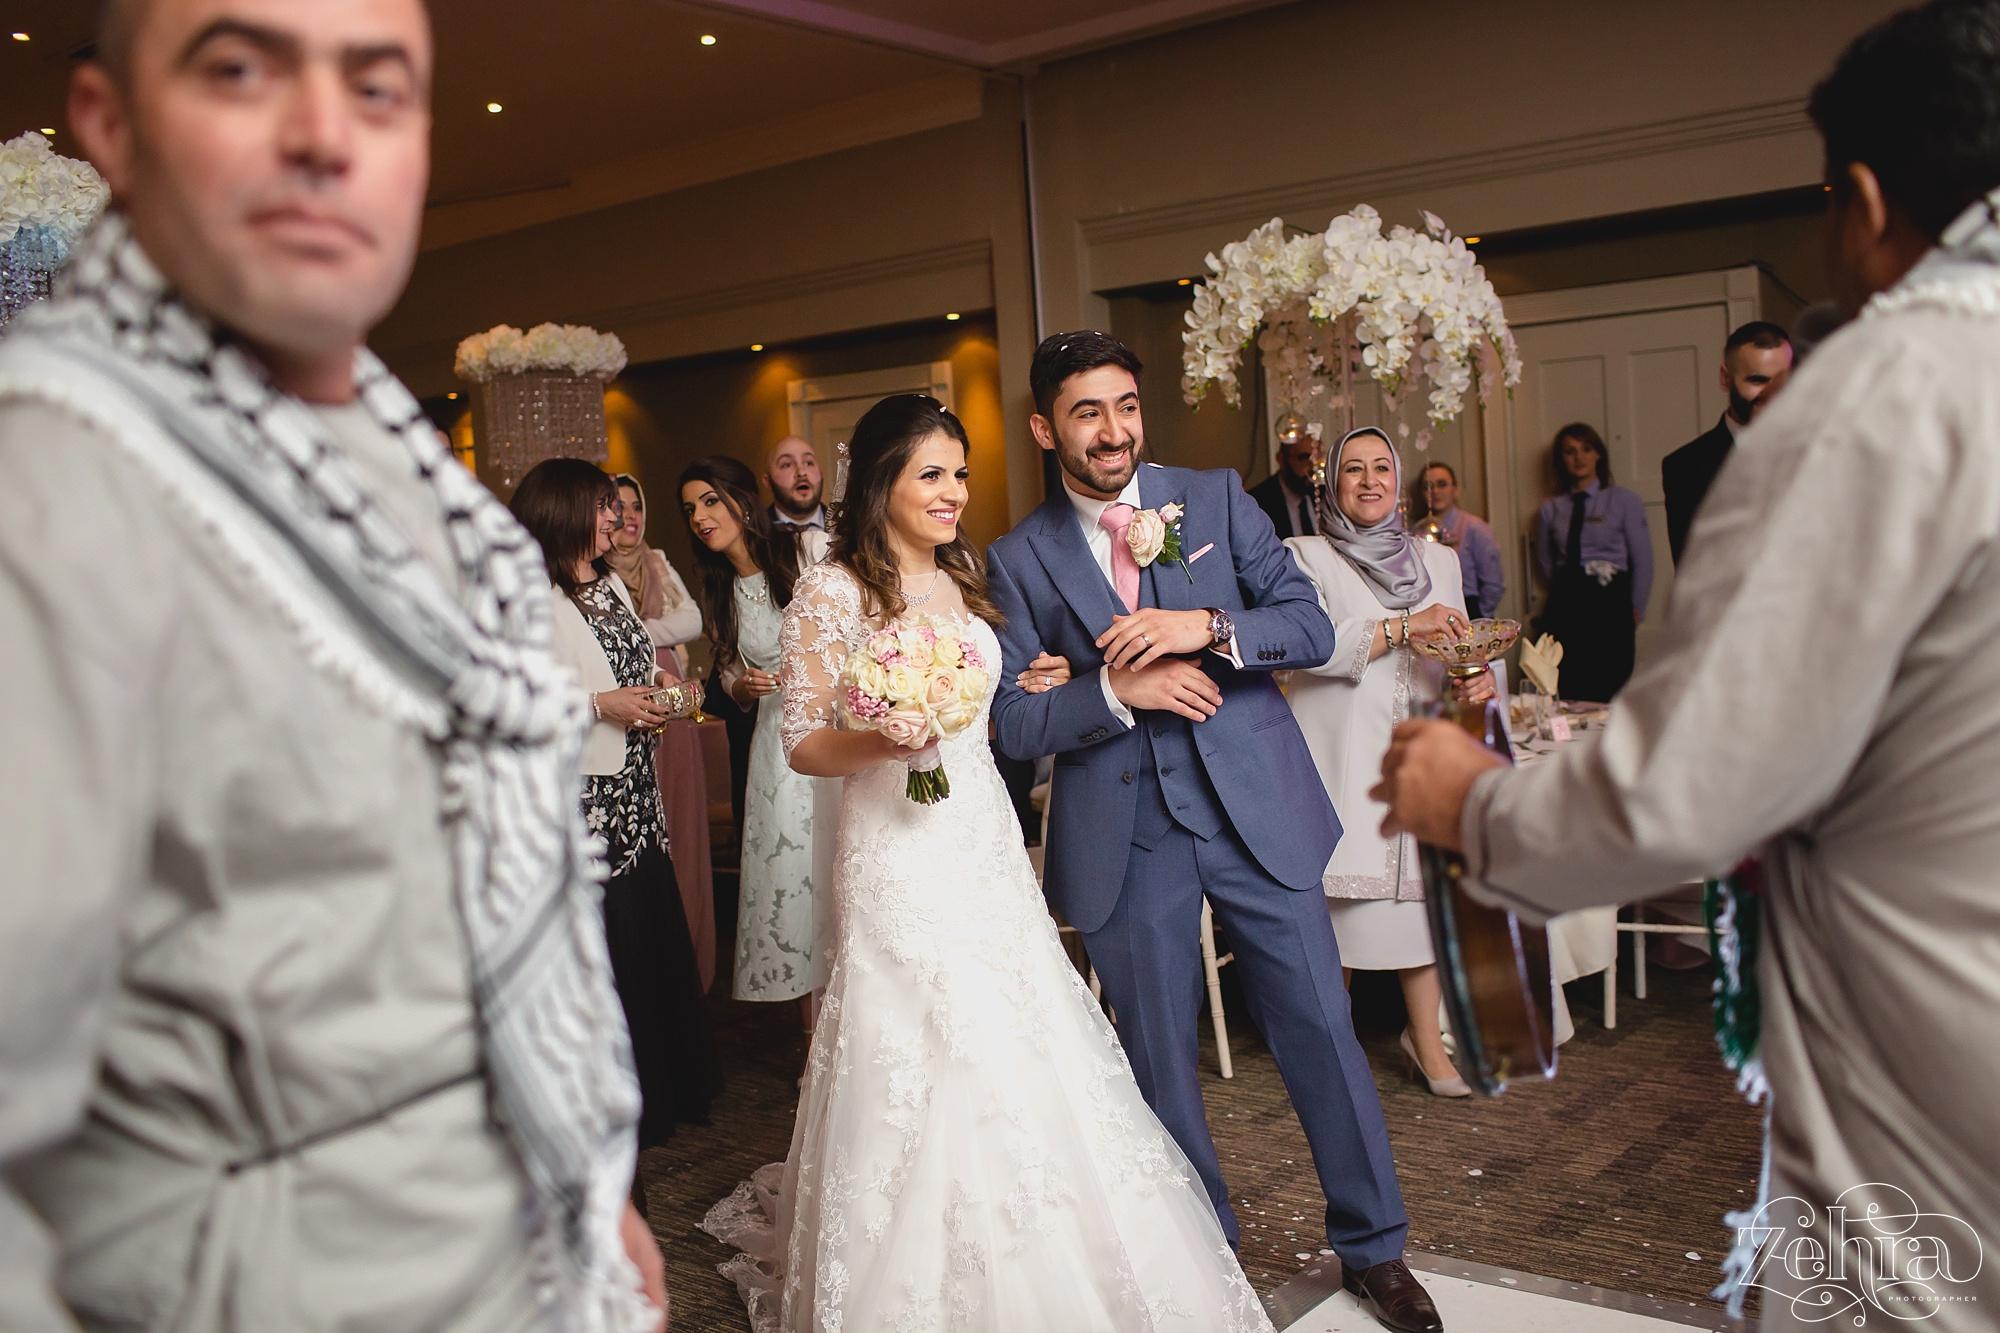 zehra photographer mere cheshire wedding_0029.jpg